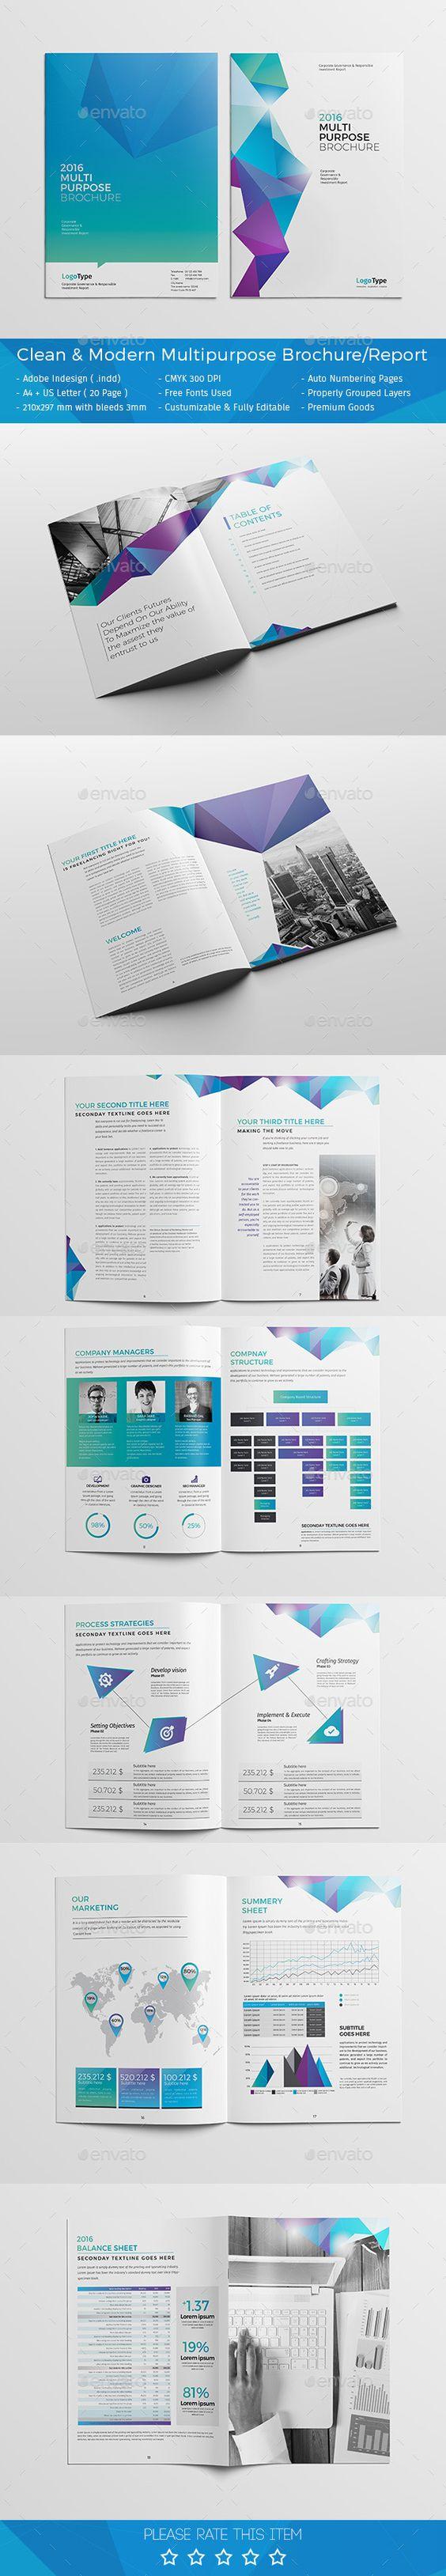 brochure design quotation - clean modern multipurpose brochure report design